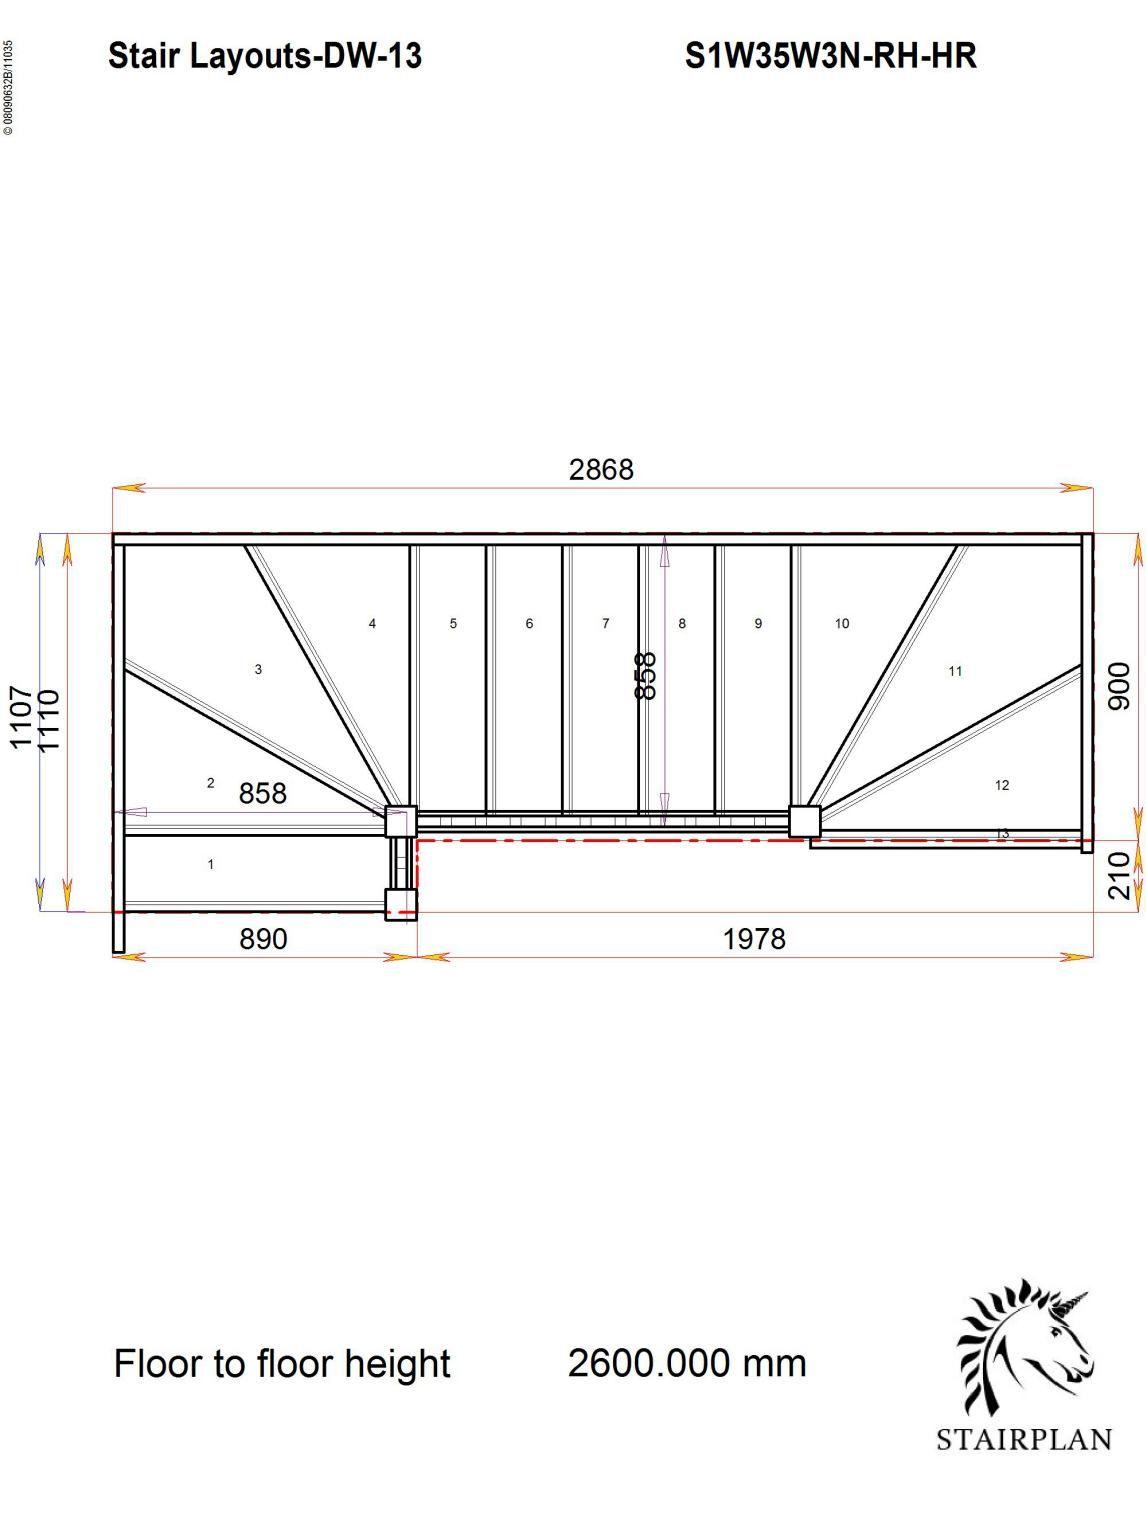 medium resolution of tradestairs rh double winder handrail